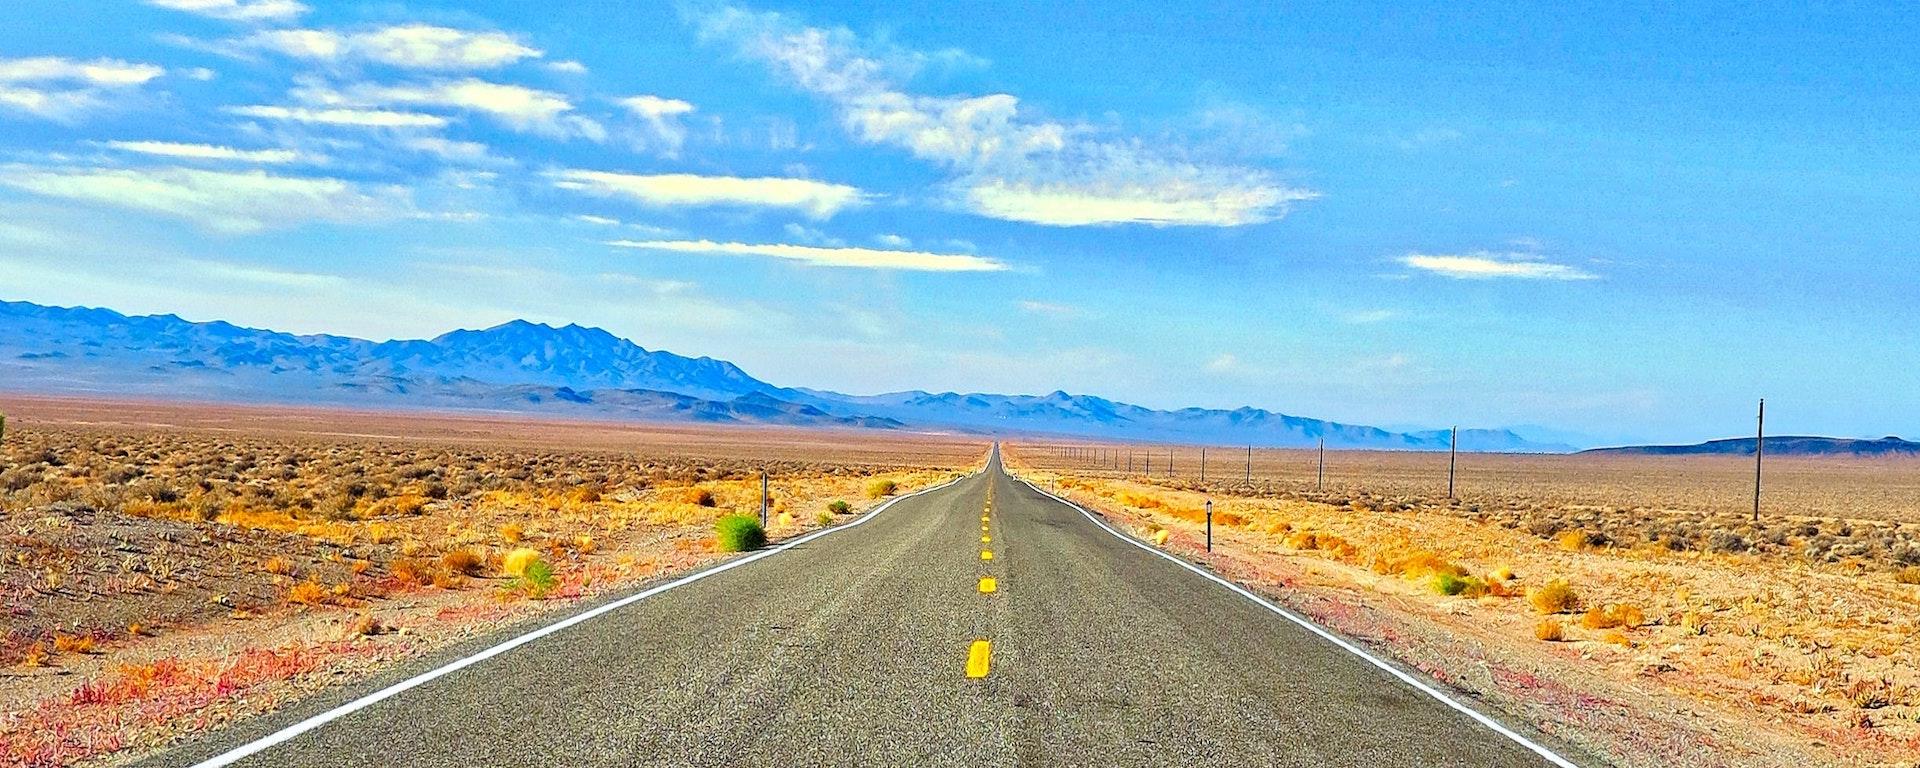 arizona-asphalt-beautiful-blue-sky-490466 copy